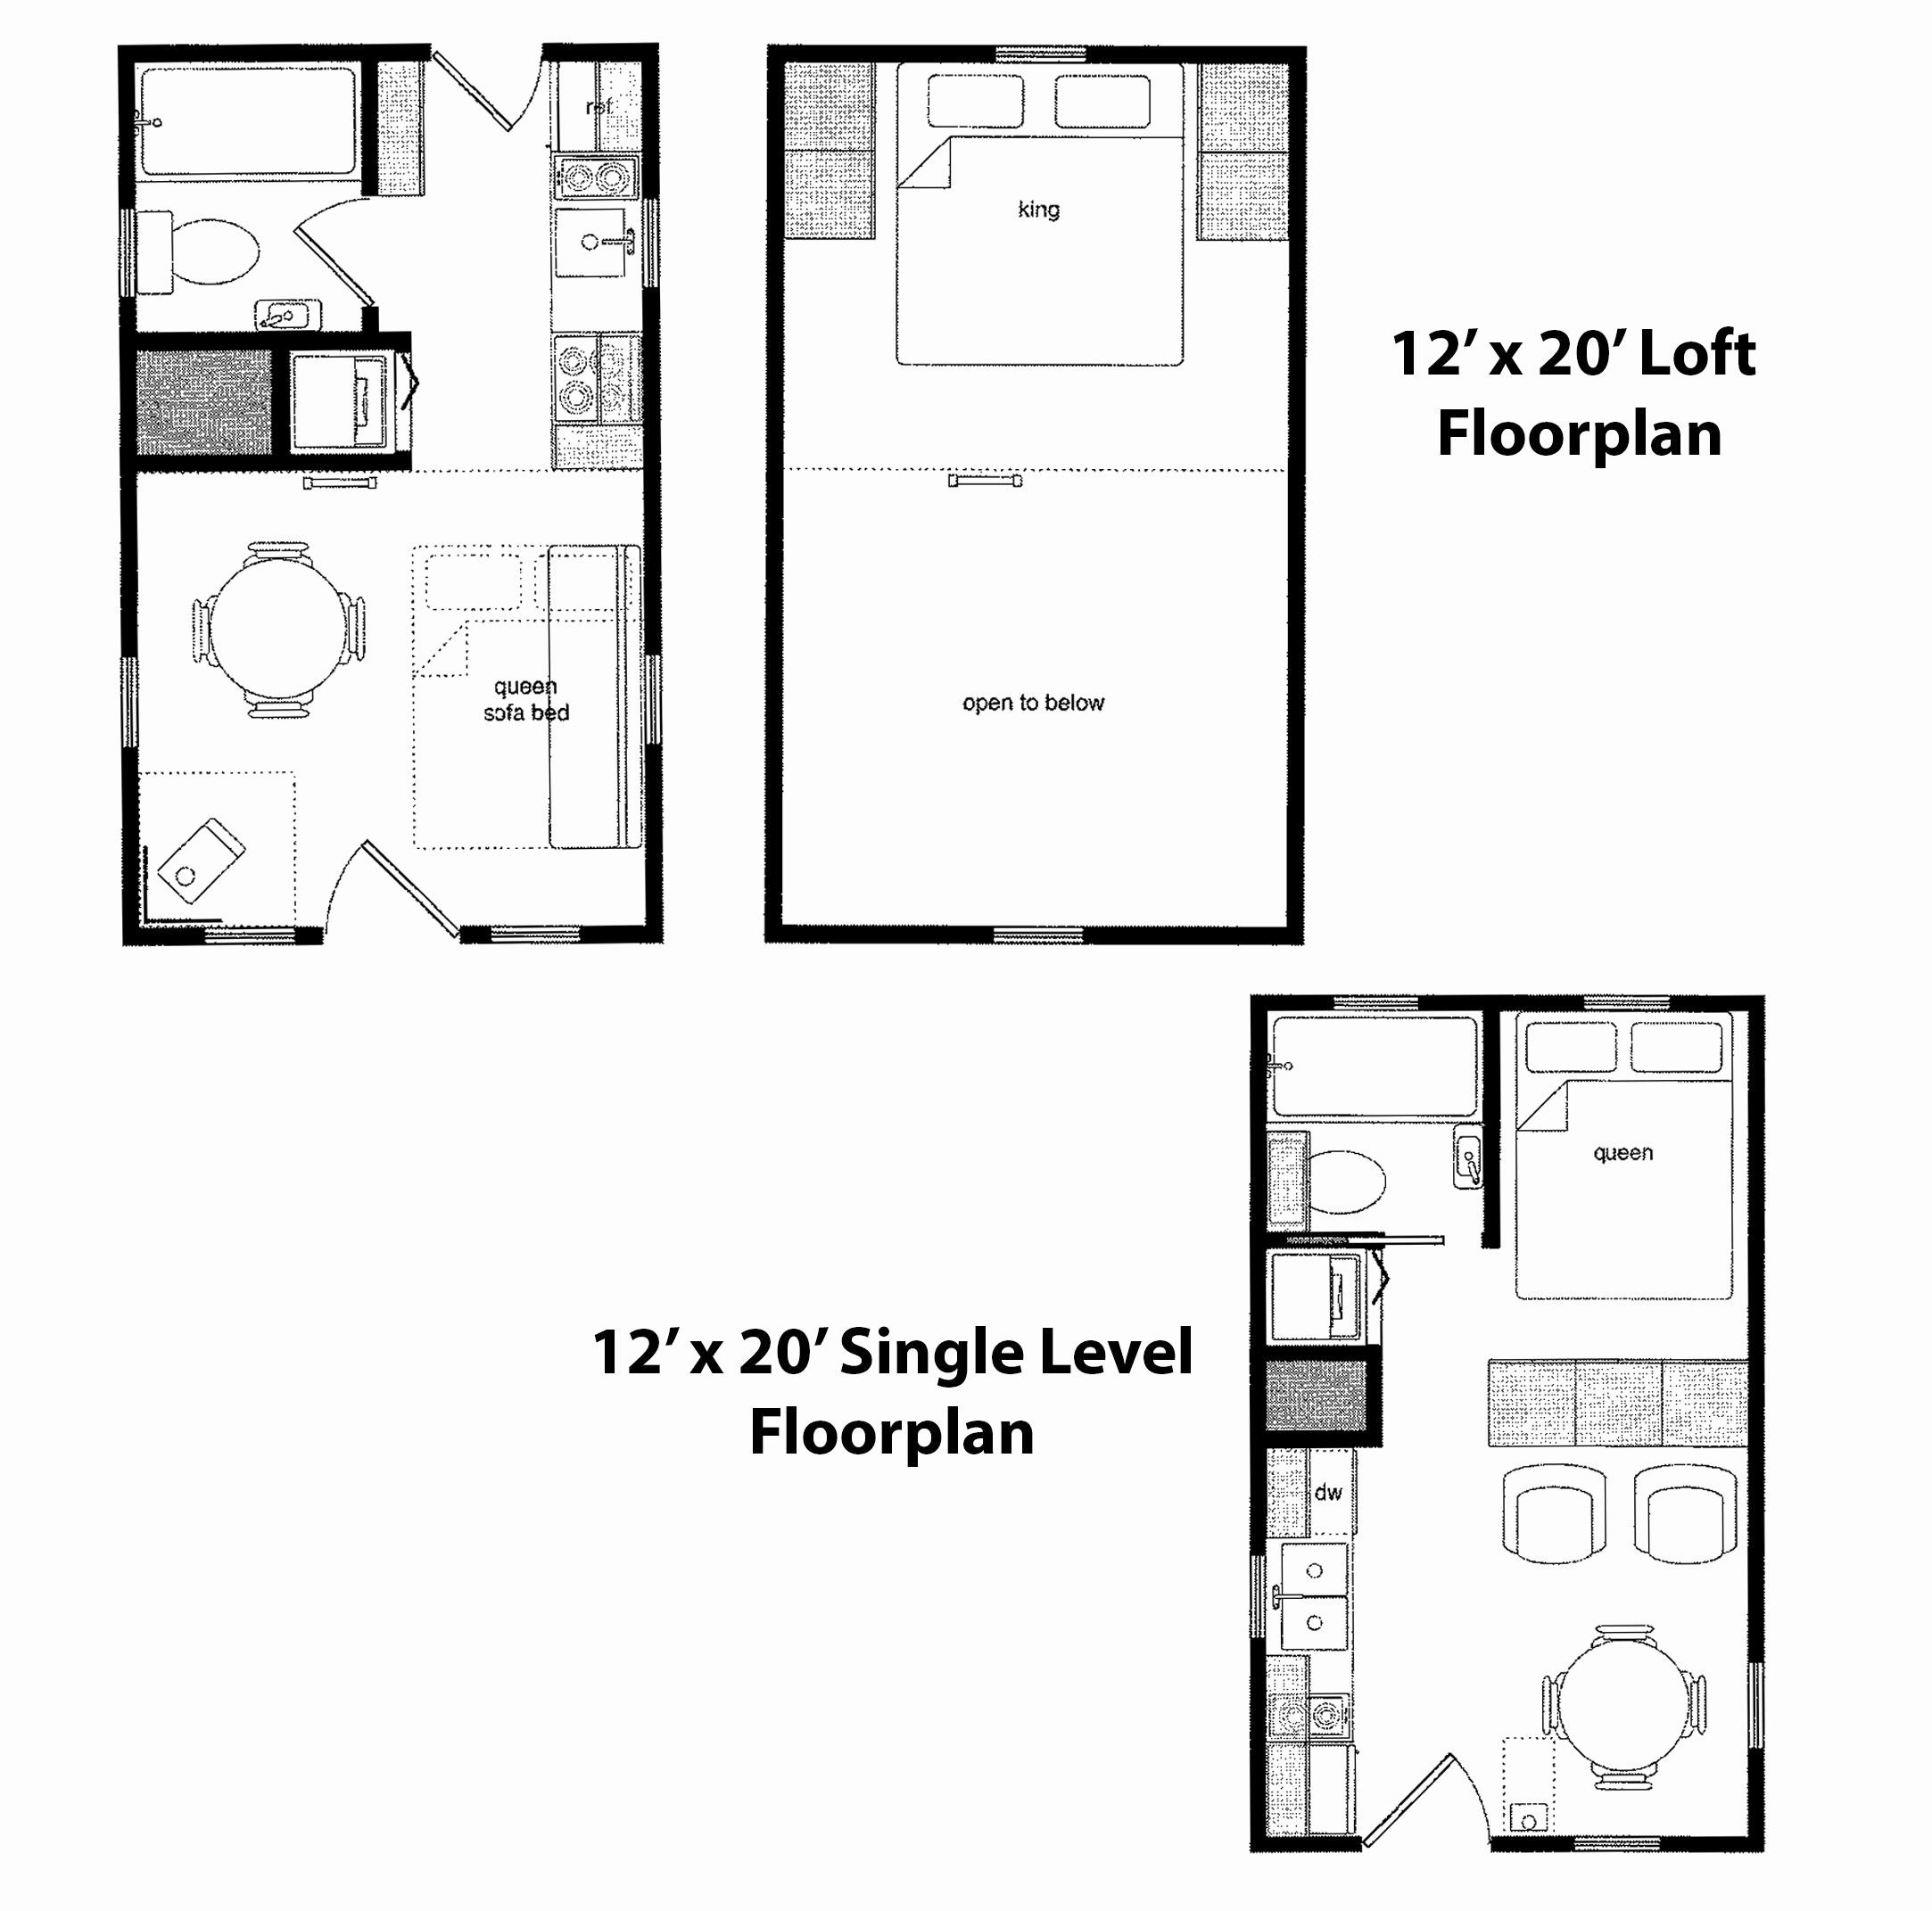 12 24 Cabin Floor Plans Fresh 16 24 Floor Plan Best Jbr Floor Plans Inspirational 0d House Plan Of 12 Loft Floor Plans Cabin Floor Plans Tiny House Floor Plans